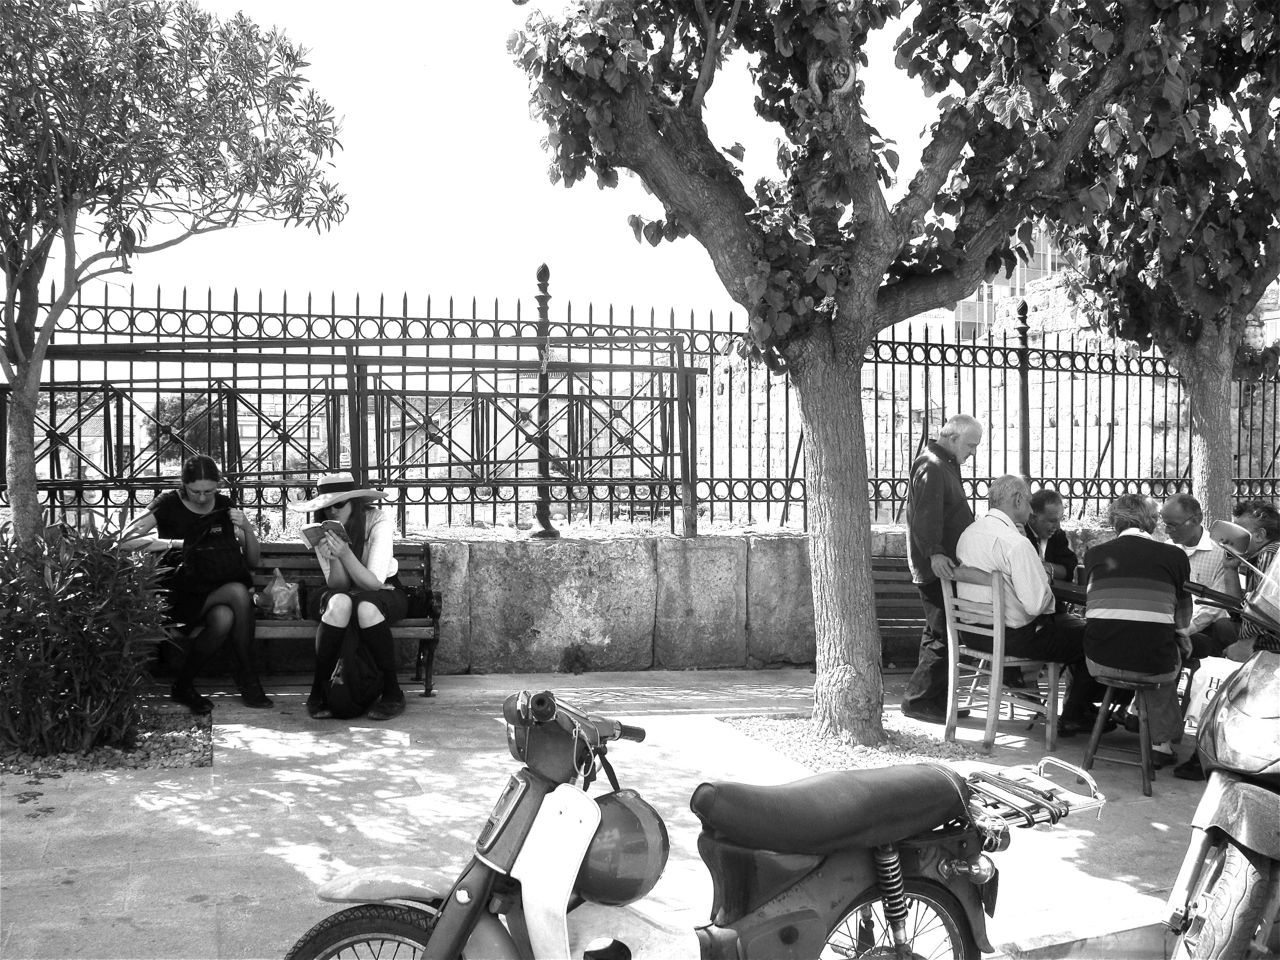 Tourists and old men playing tavli, Plaka. Photo by Alexia Amvrazi.